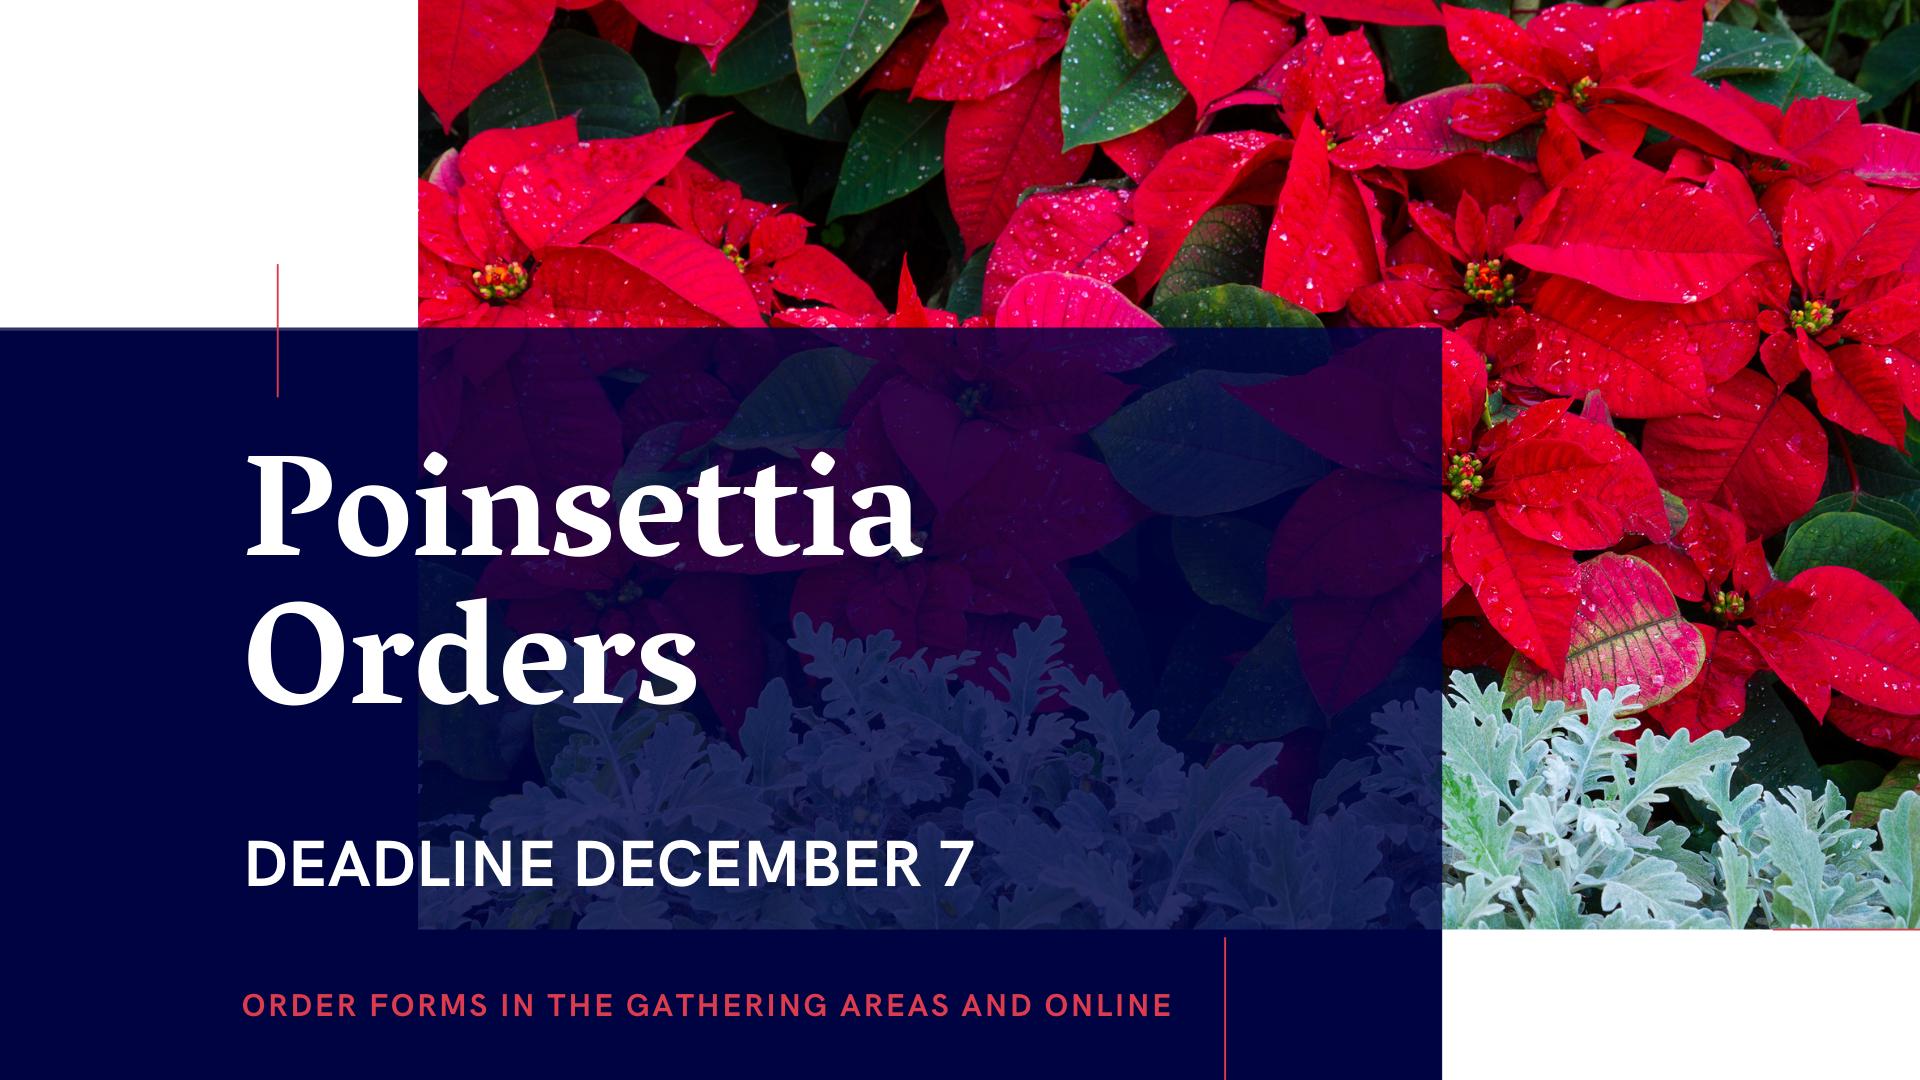 Poinsettia Orders 2020